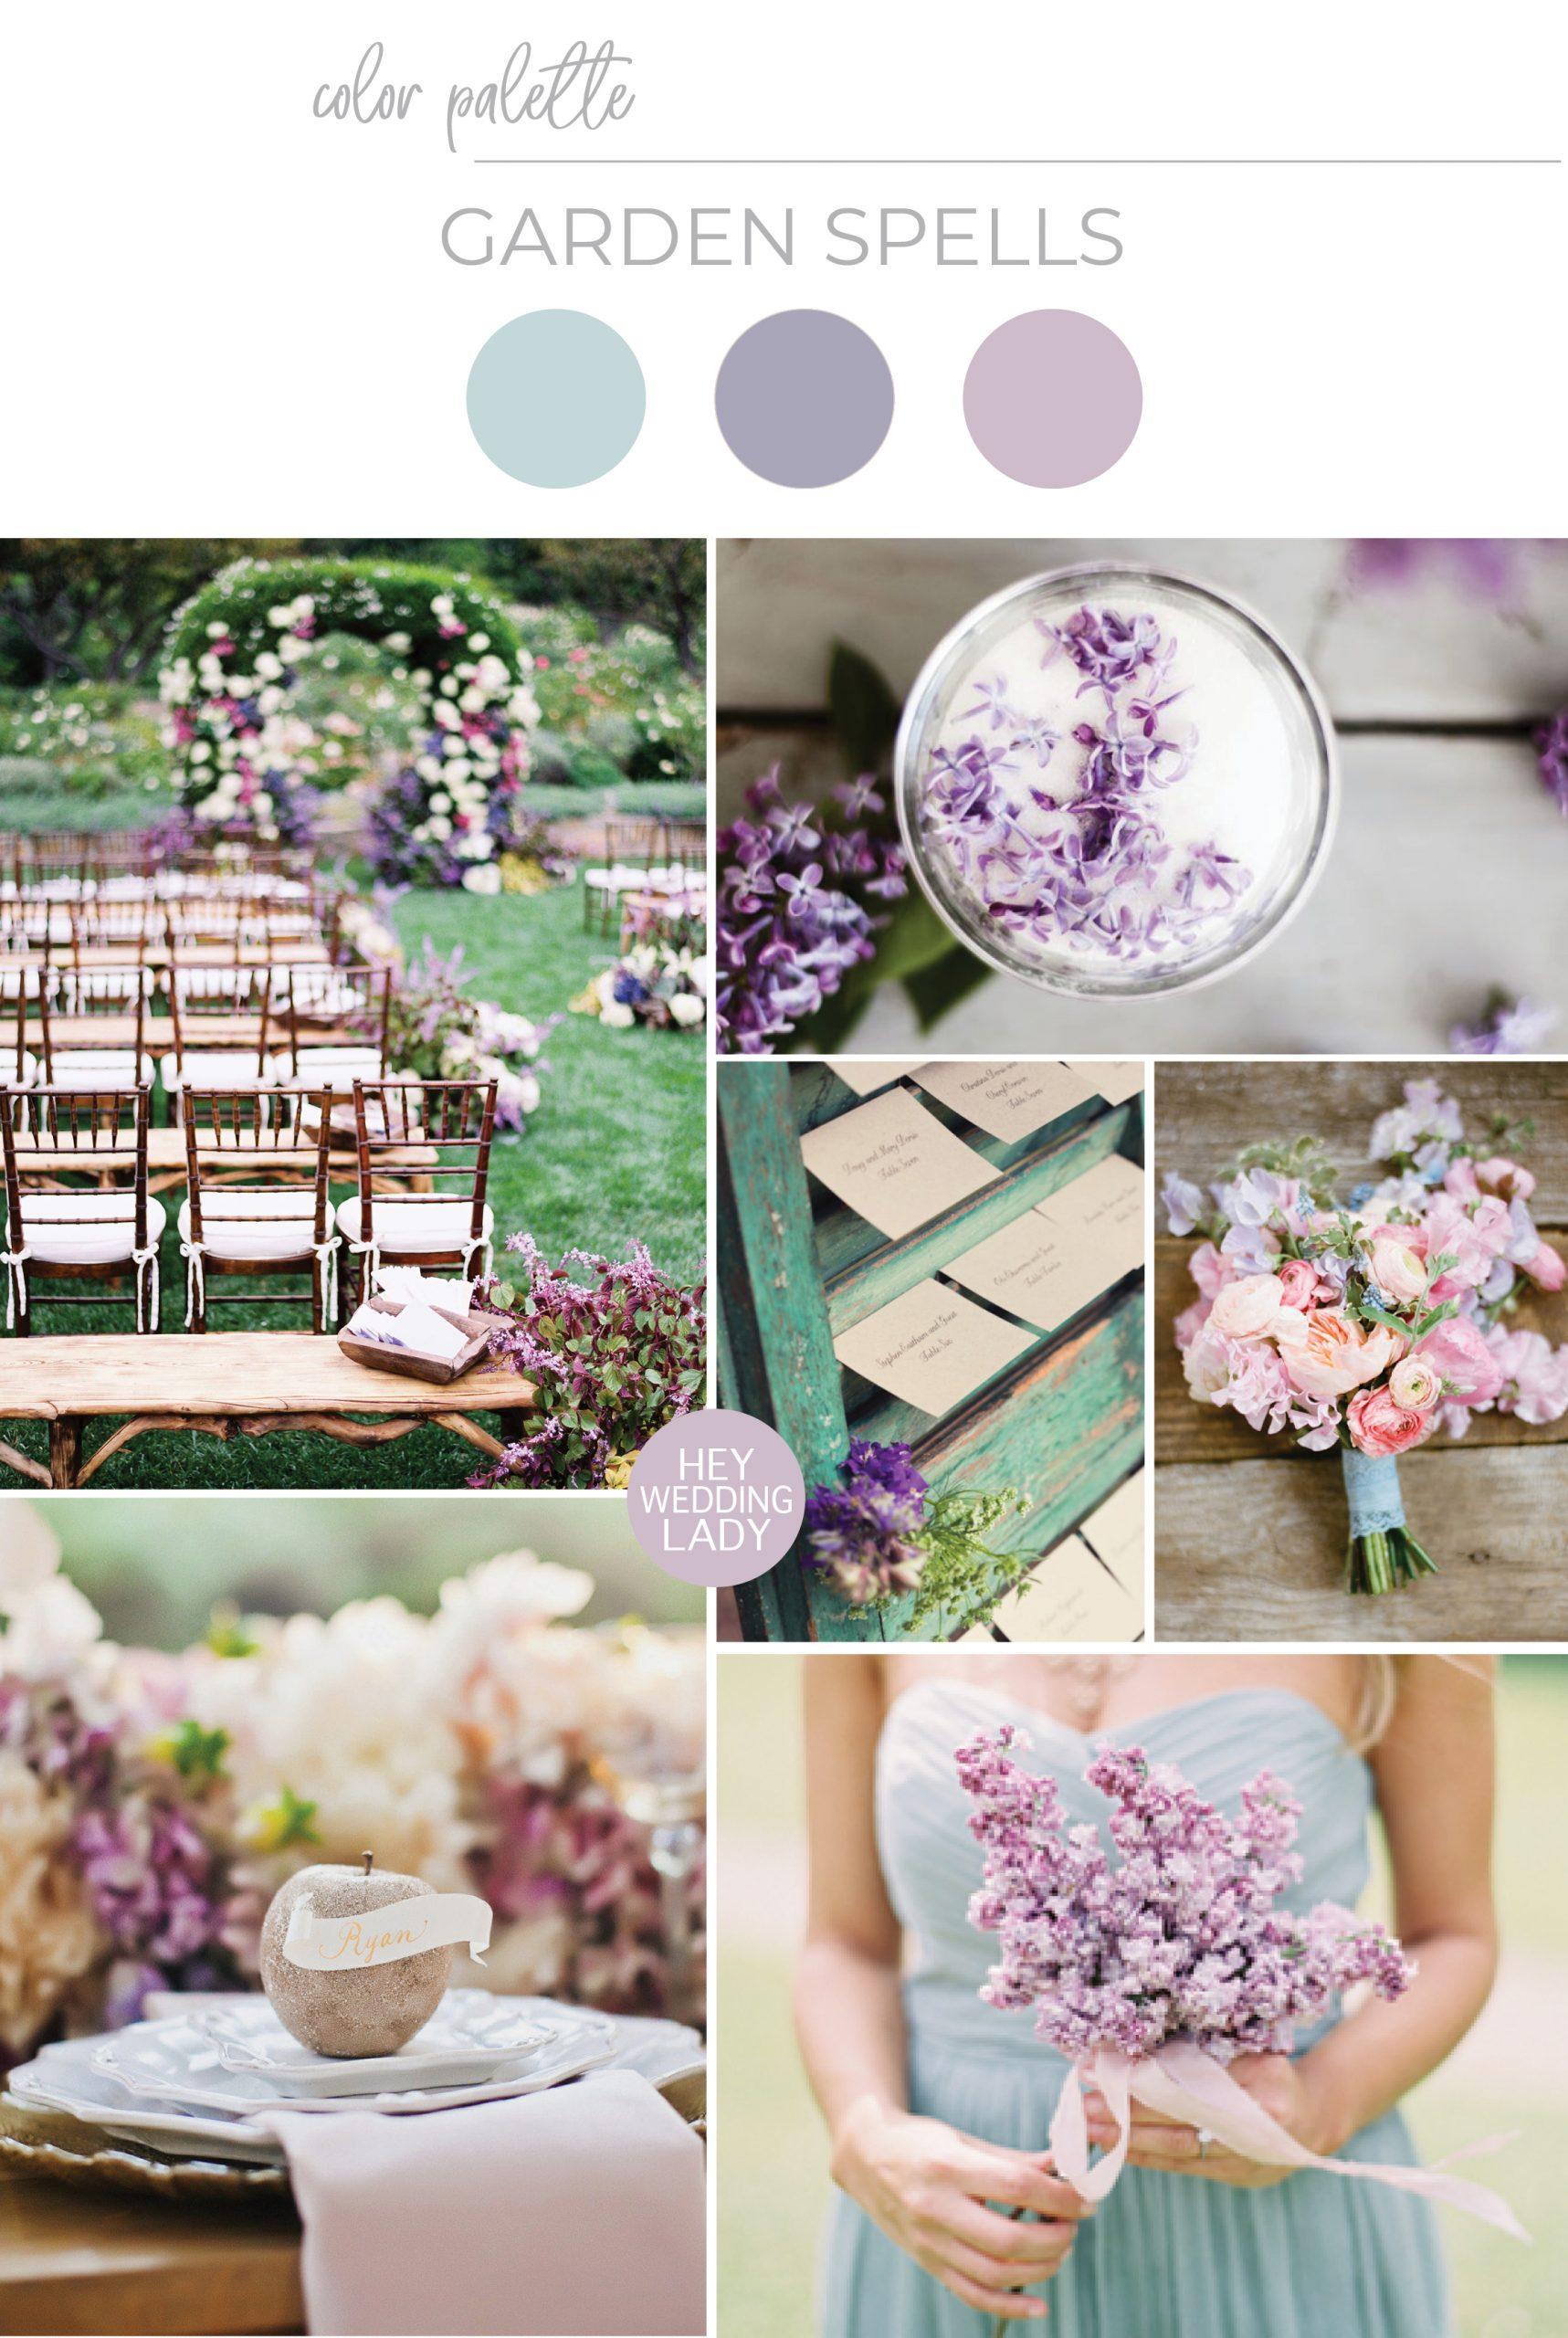 Garden Spells - Enchanting Lilac and Soft Green Southern Garden Wedding